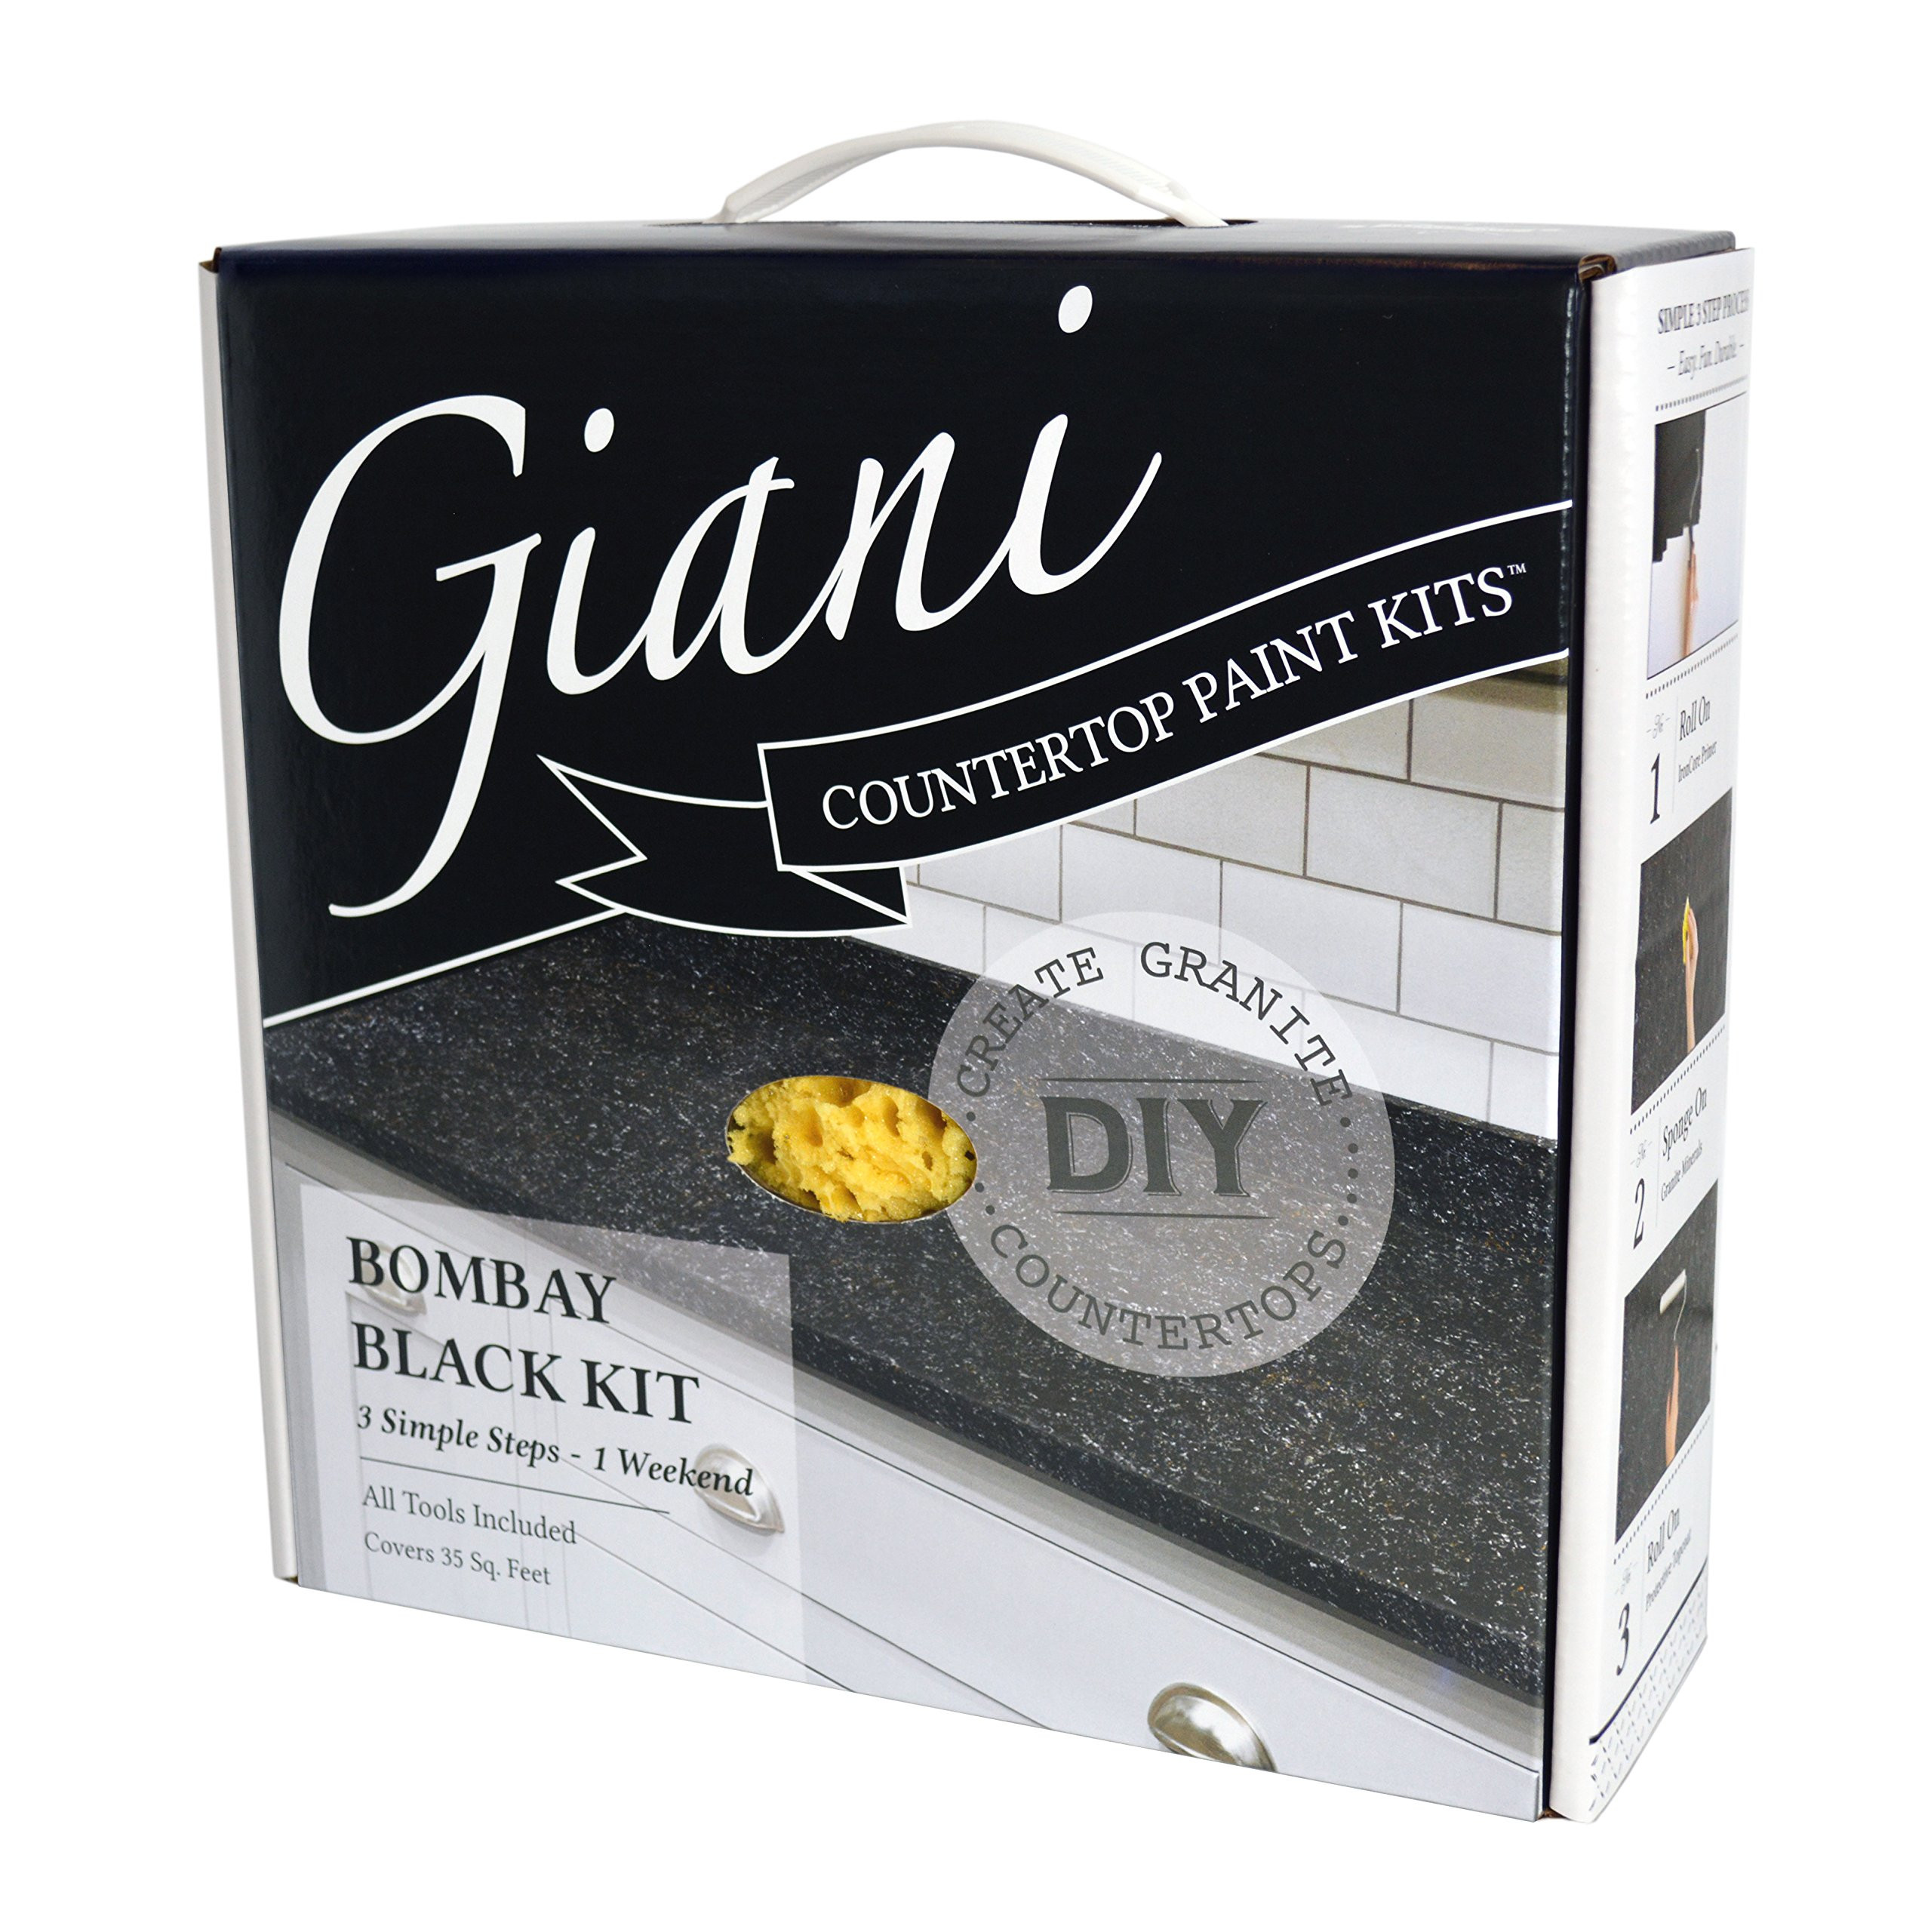 Giani Countertop Paint Kit, Bombay Black by Giani Granite